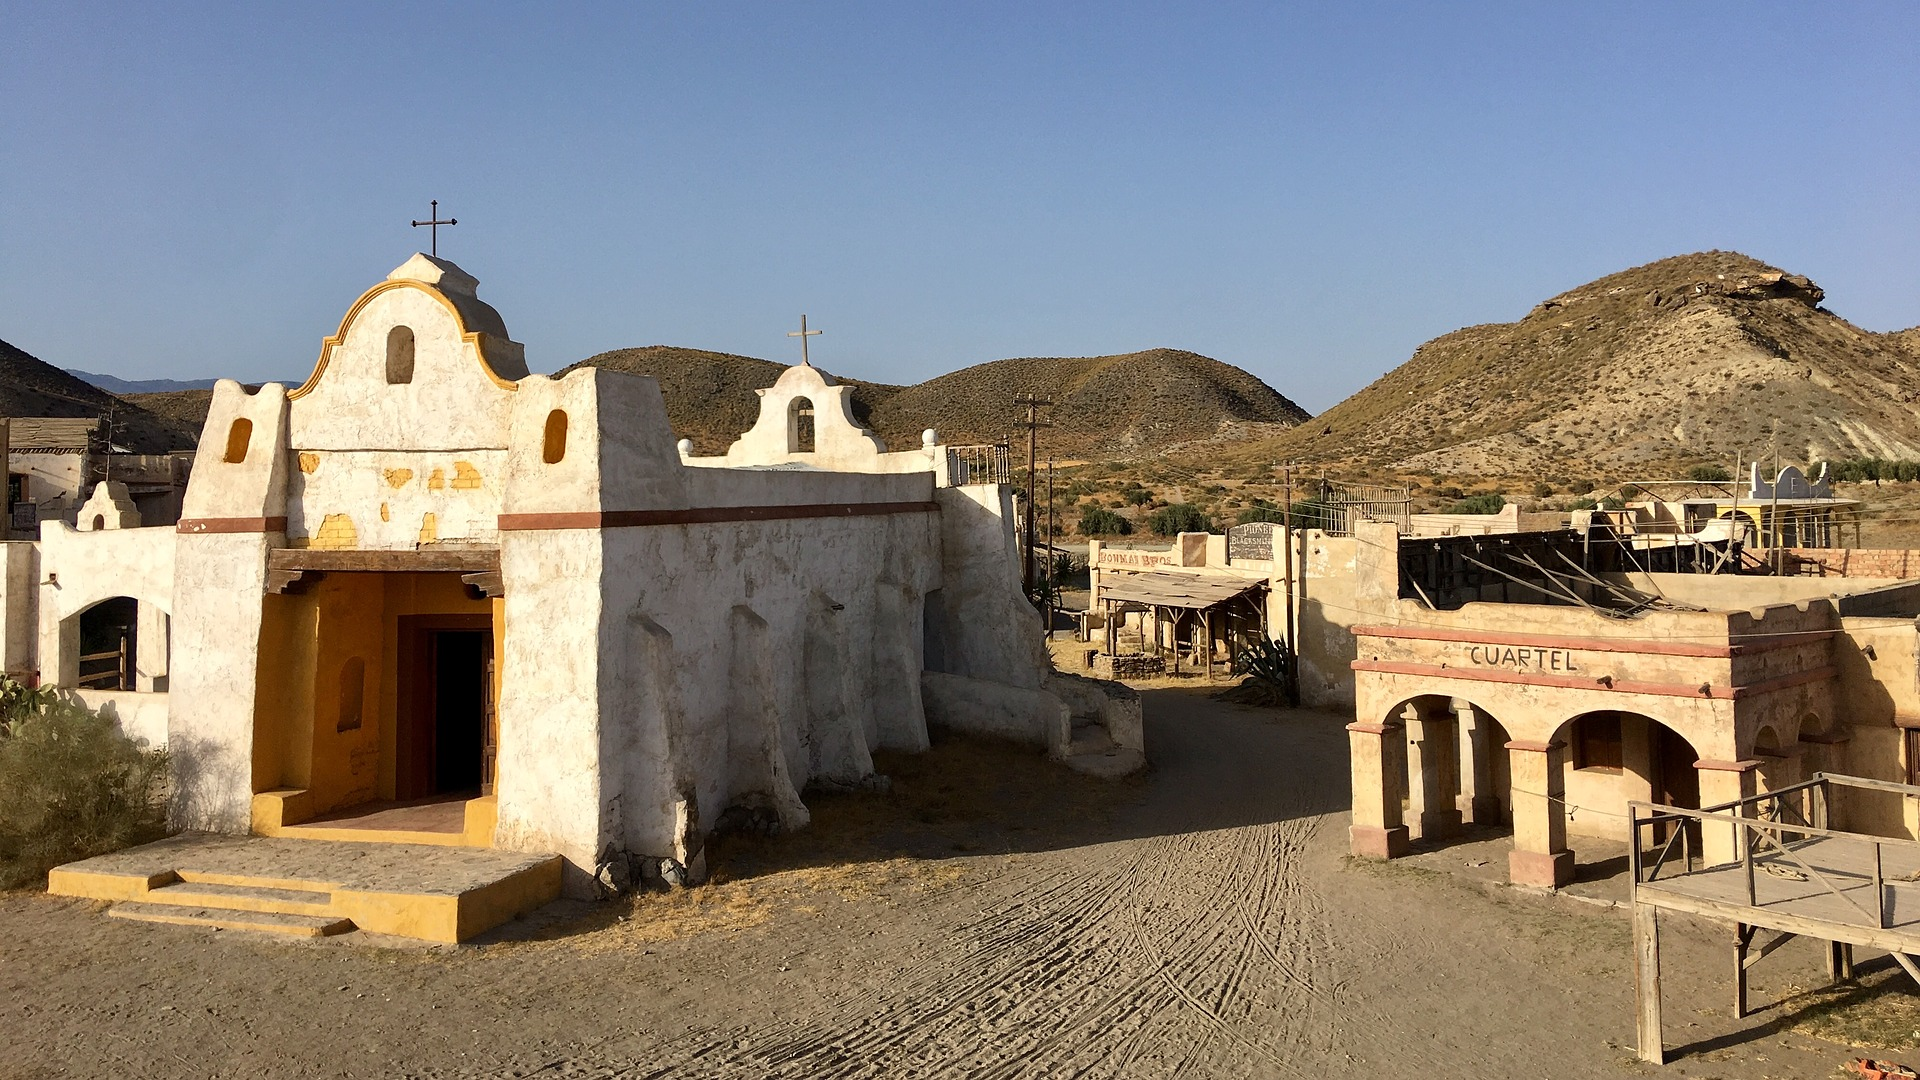 Image of Excursion to the Tabernas Desert from Almeria and Roquetas de Mar.